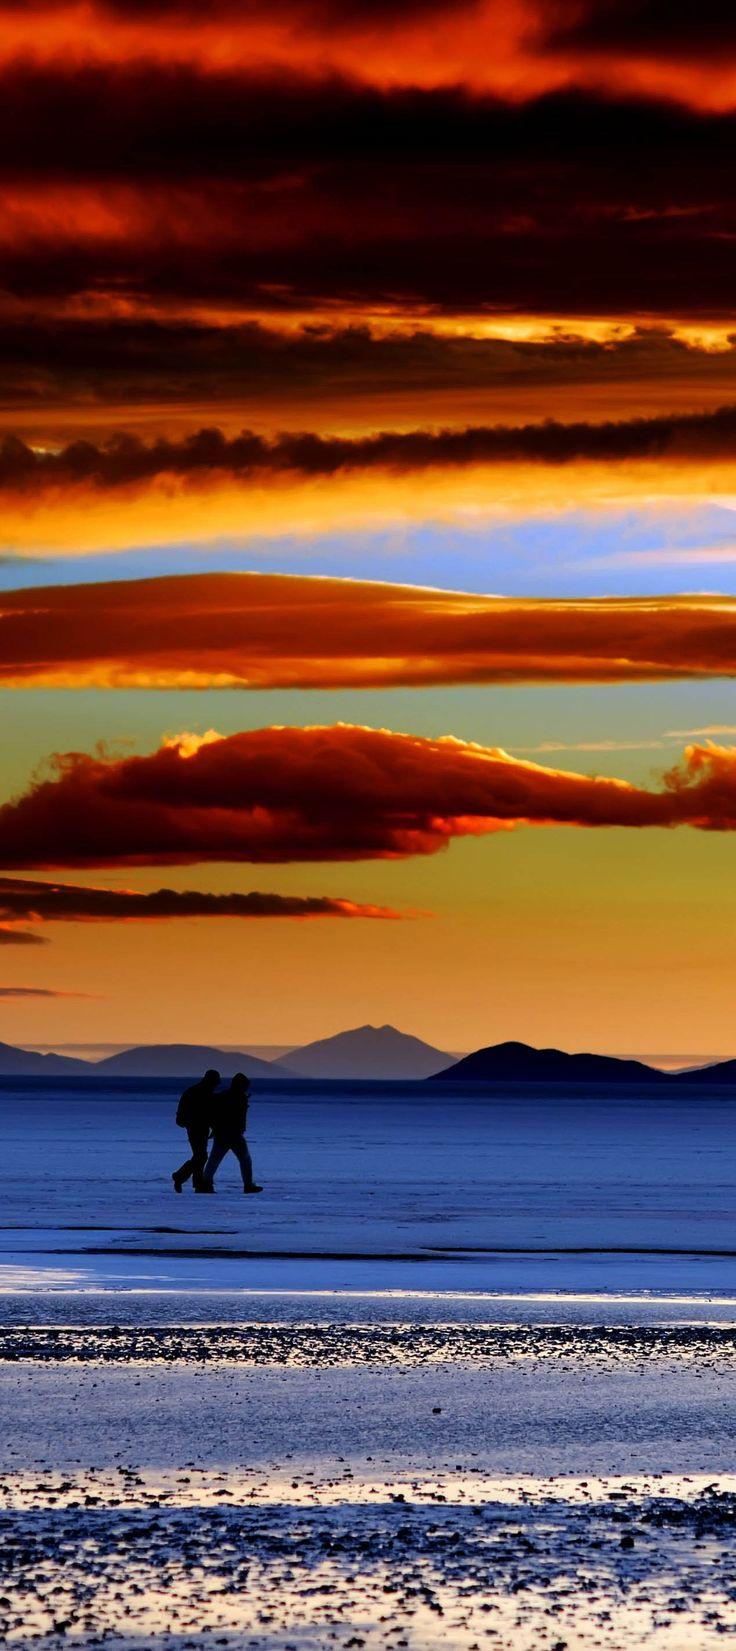 fiery sunset over the Salar de Uyuni in Bolivia.